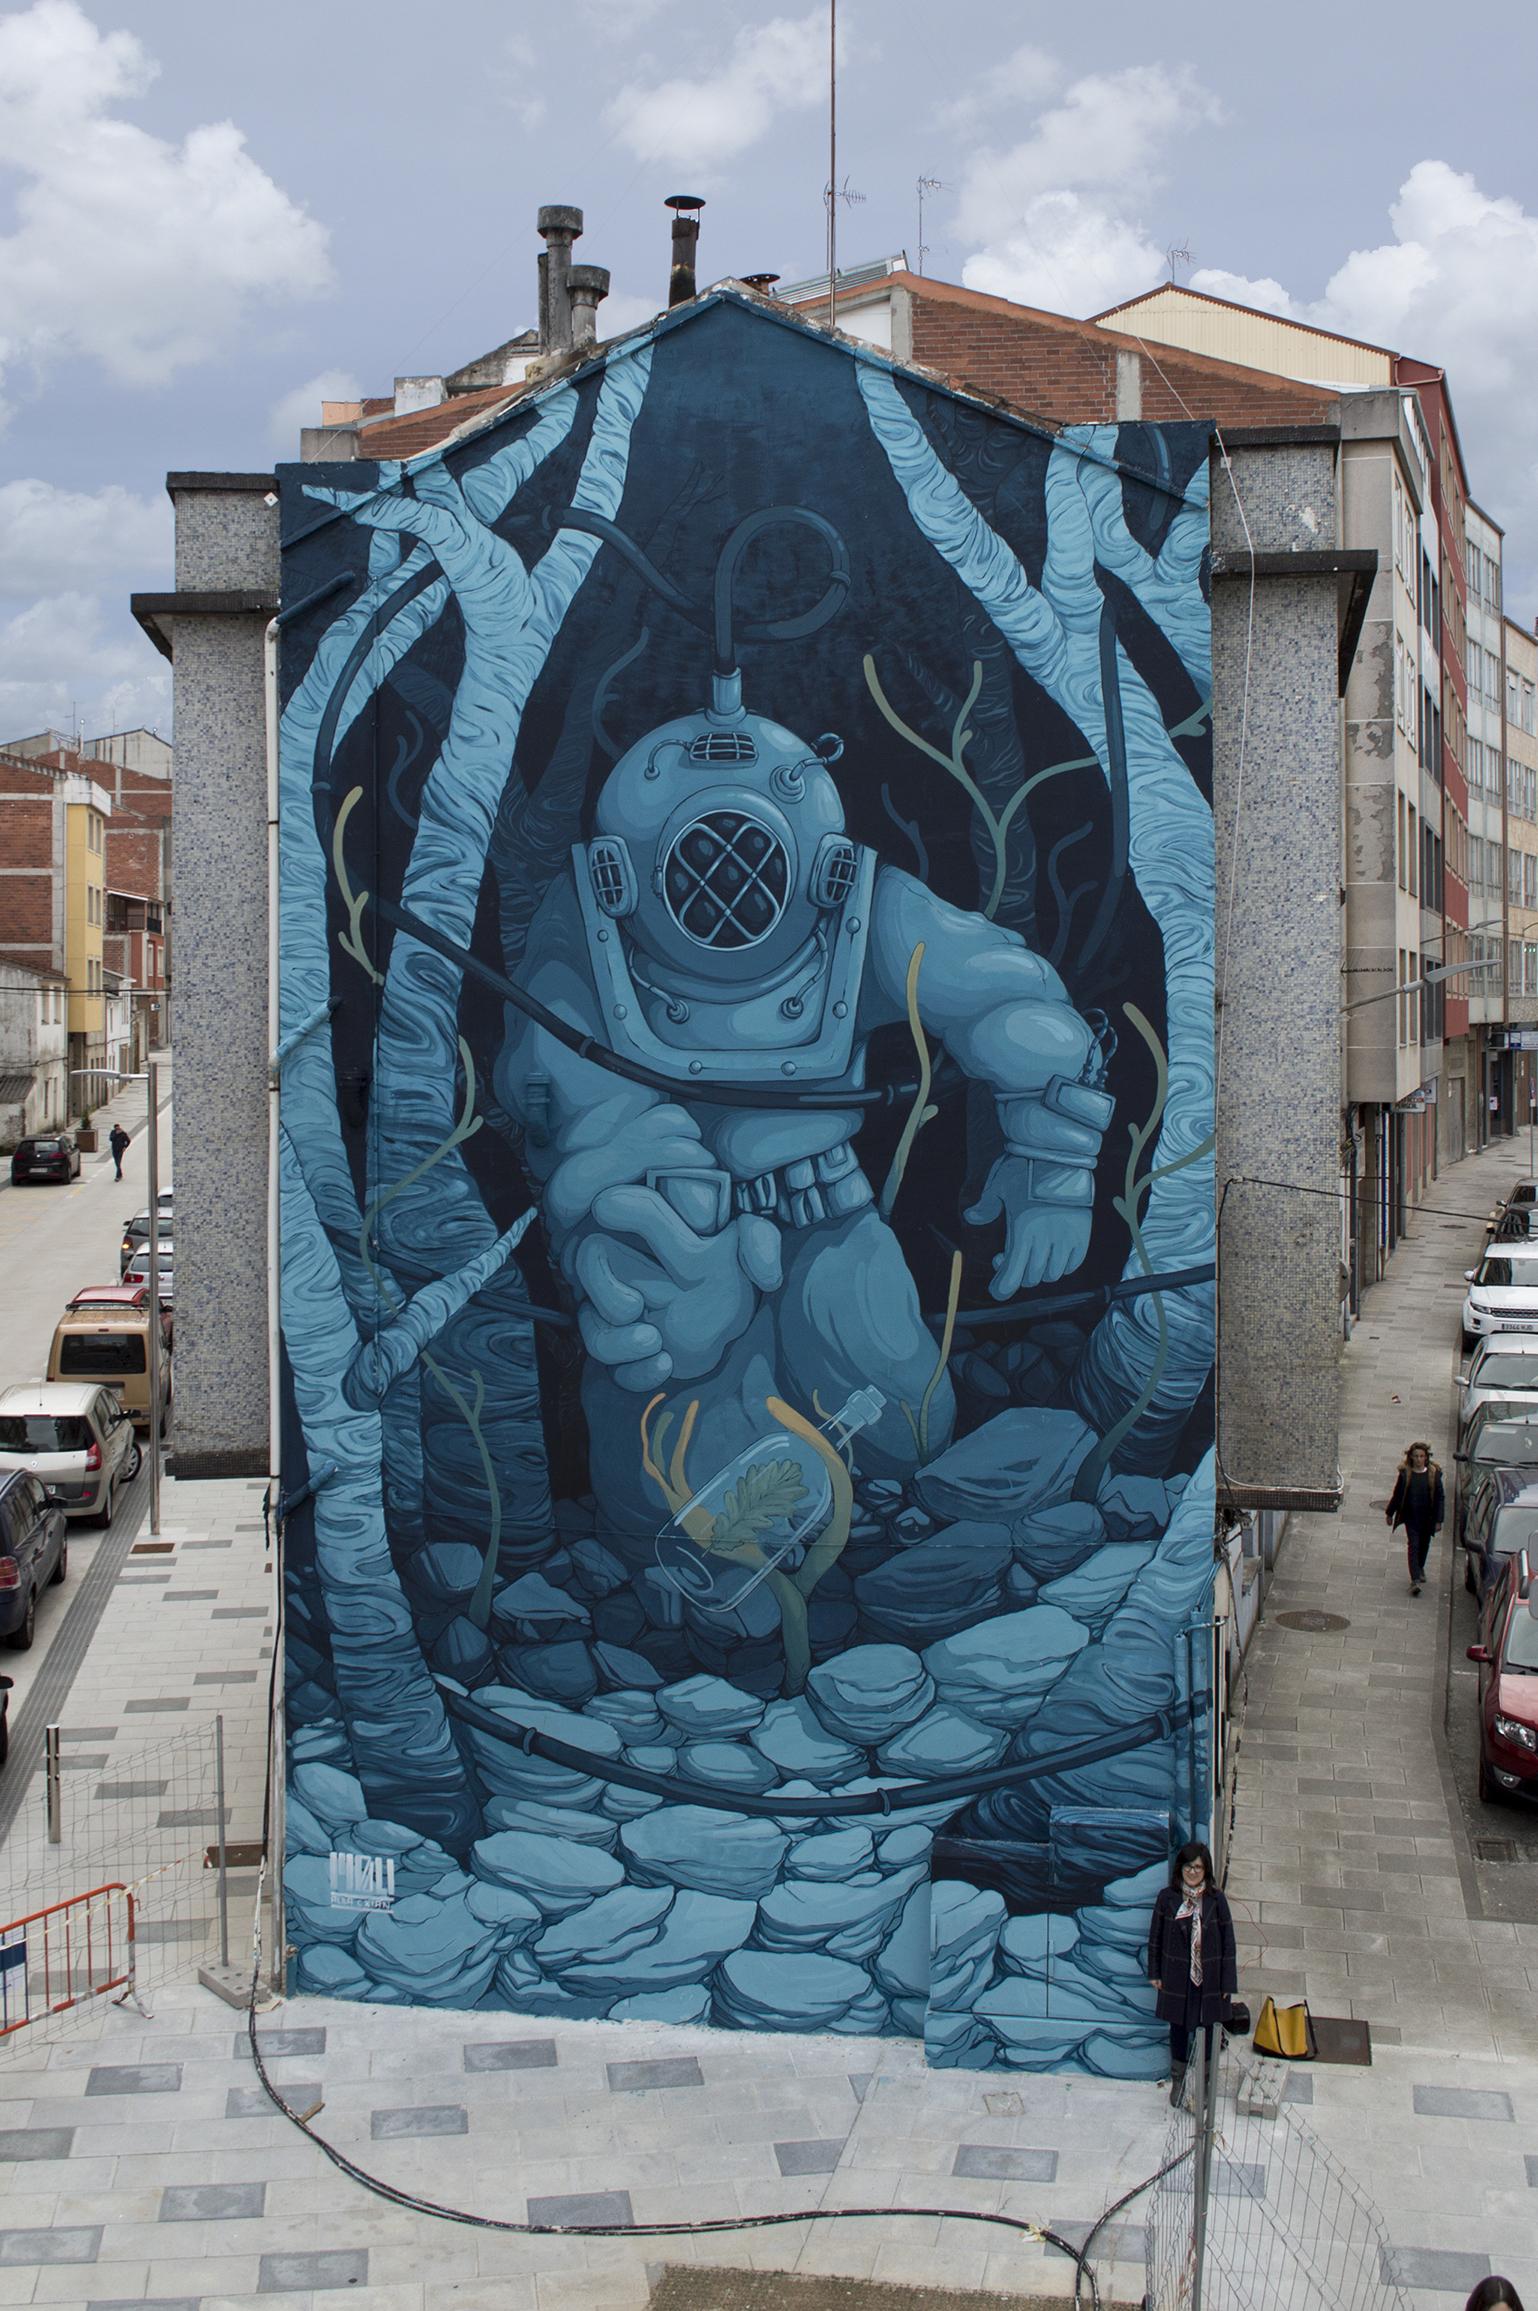 The Origin By MØU for Mutante Creativo in Spain Artes & contextos MØU 2